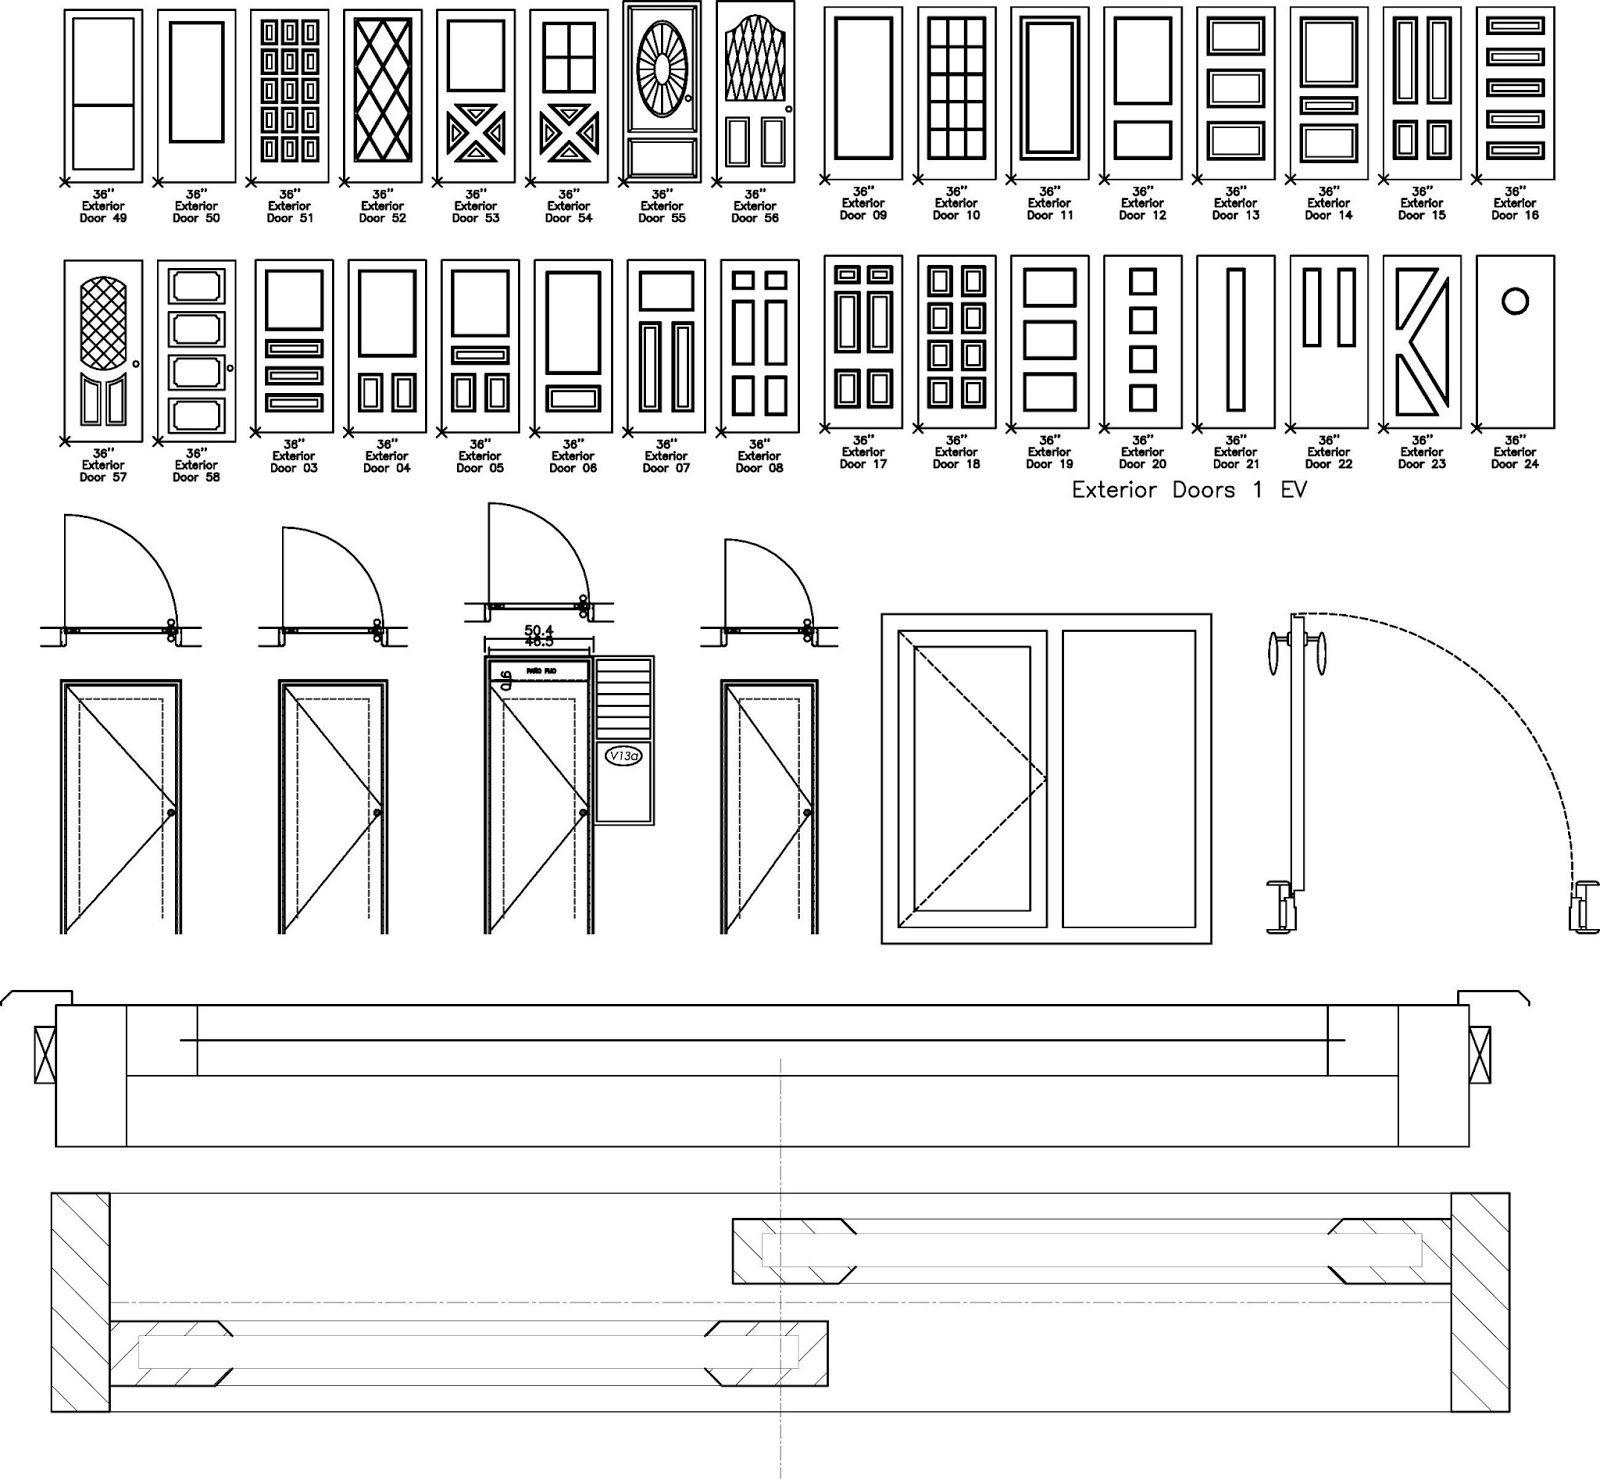 Autocad archicad revit lumion artlantis arcgis clases for Simbologia arquitectonica para planos